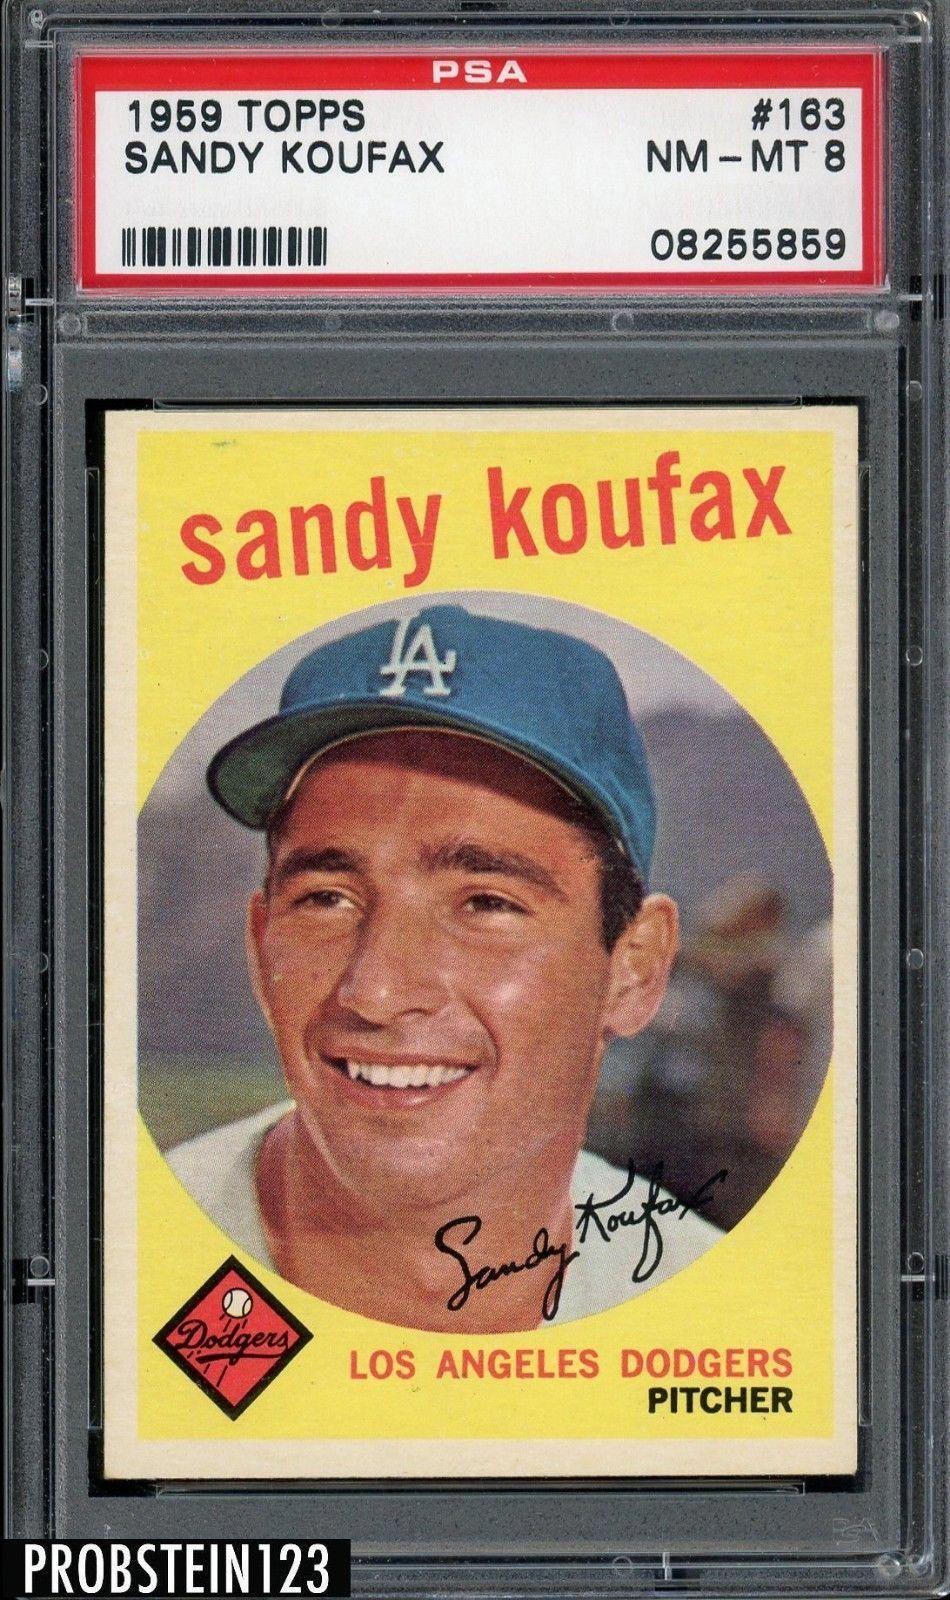 1959 Topps 163 Sandy Koufax Los Angeles Dodgers HOF PSA 8